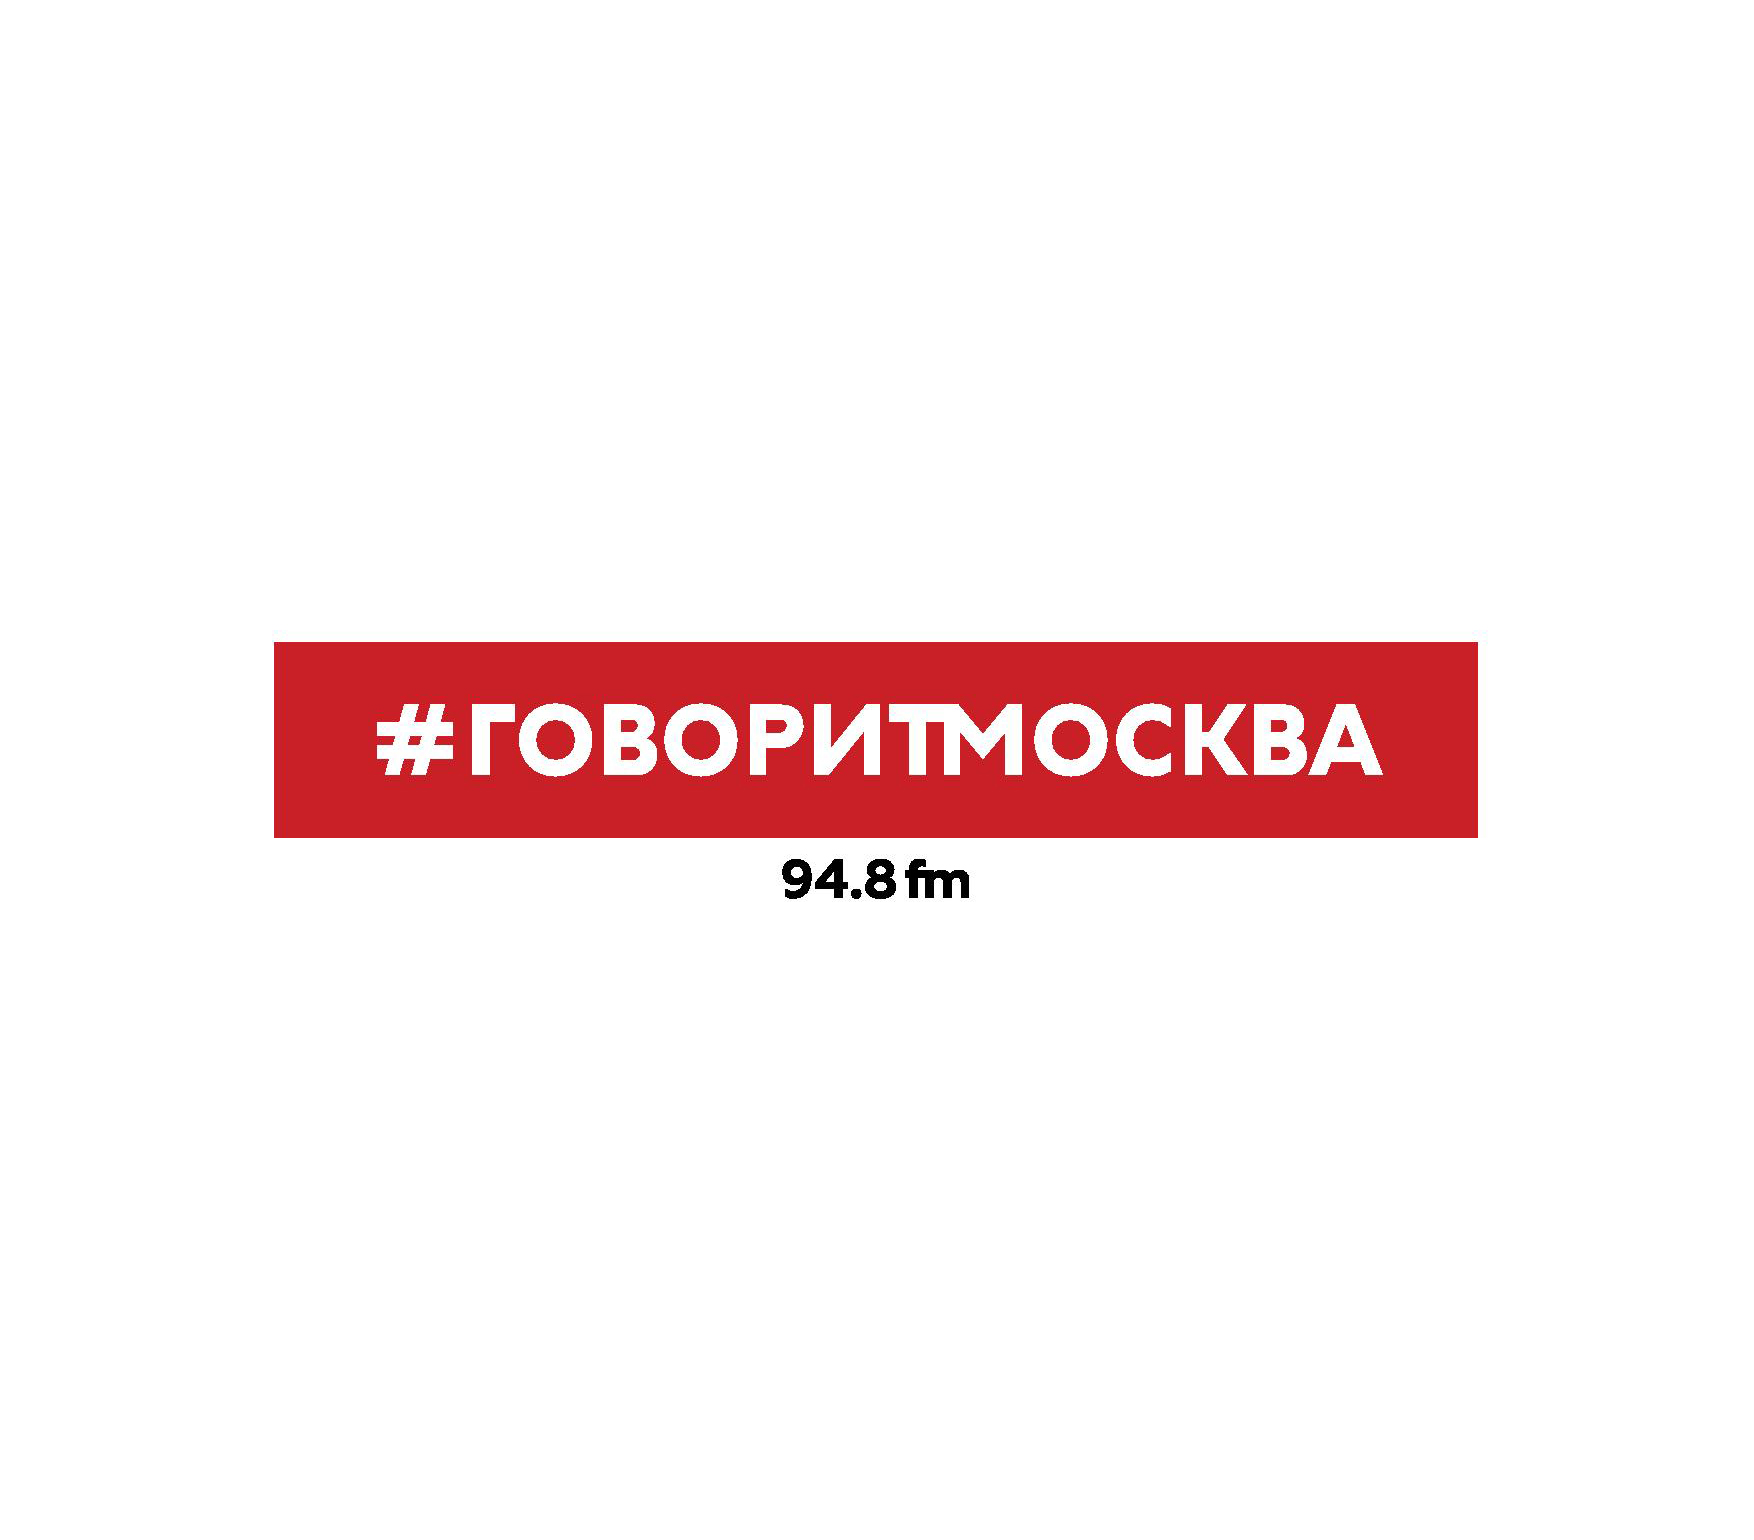 Макс Челноков 25 марта. Борис Надеждин надеждин н кнут гамсун грешники и праведники